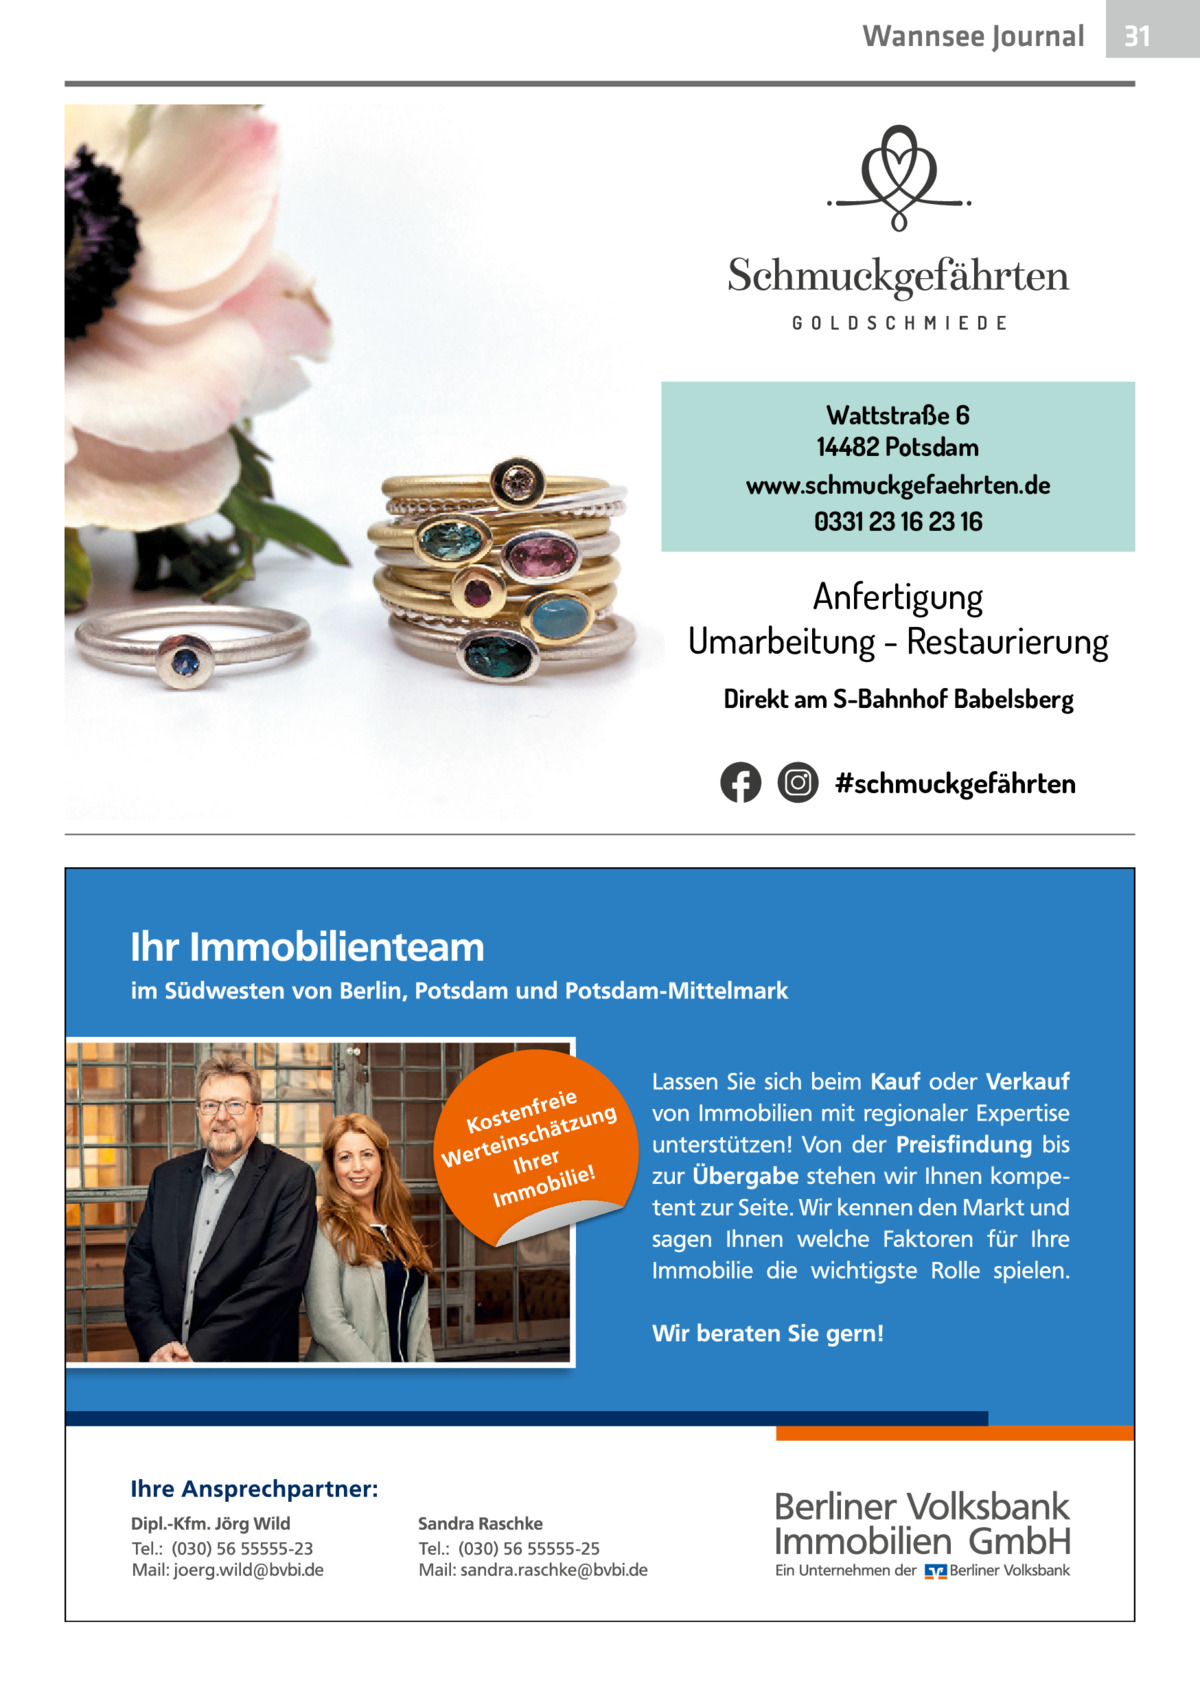 Wannsee Journal  Wattstraße 6 14482 Potsdam www.schmuckgefaehrten.de 0331 23 16 23 16  Anfertigung Umarbeitung - Restaurierung Direkt am S-Bahnhof Babelsberg  #schmuckgefährten  31